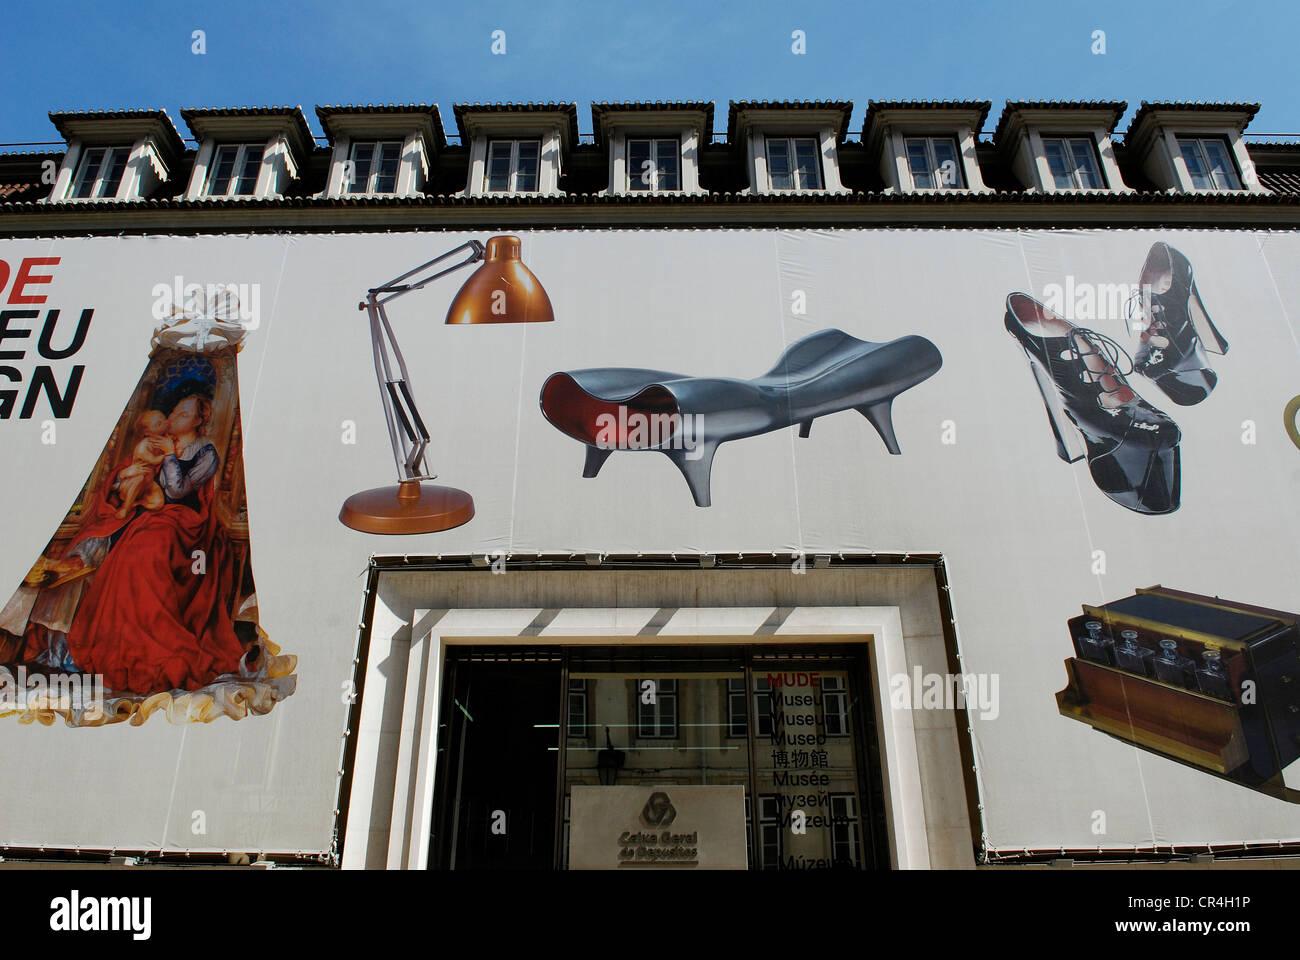 Portugal Lisbon The Mude Design And Fashion Museum Rua Augusta 24 Stock Photo Alamy